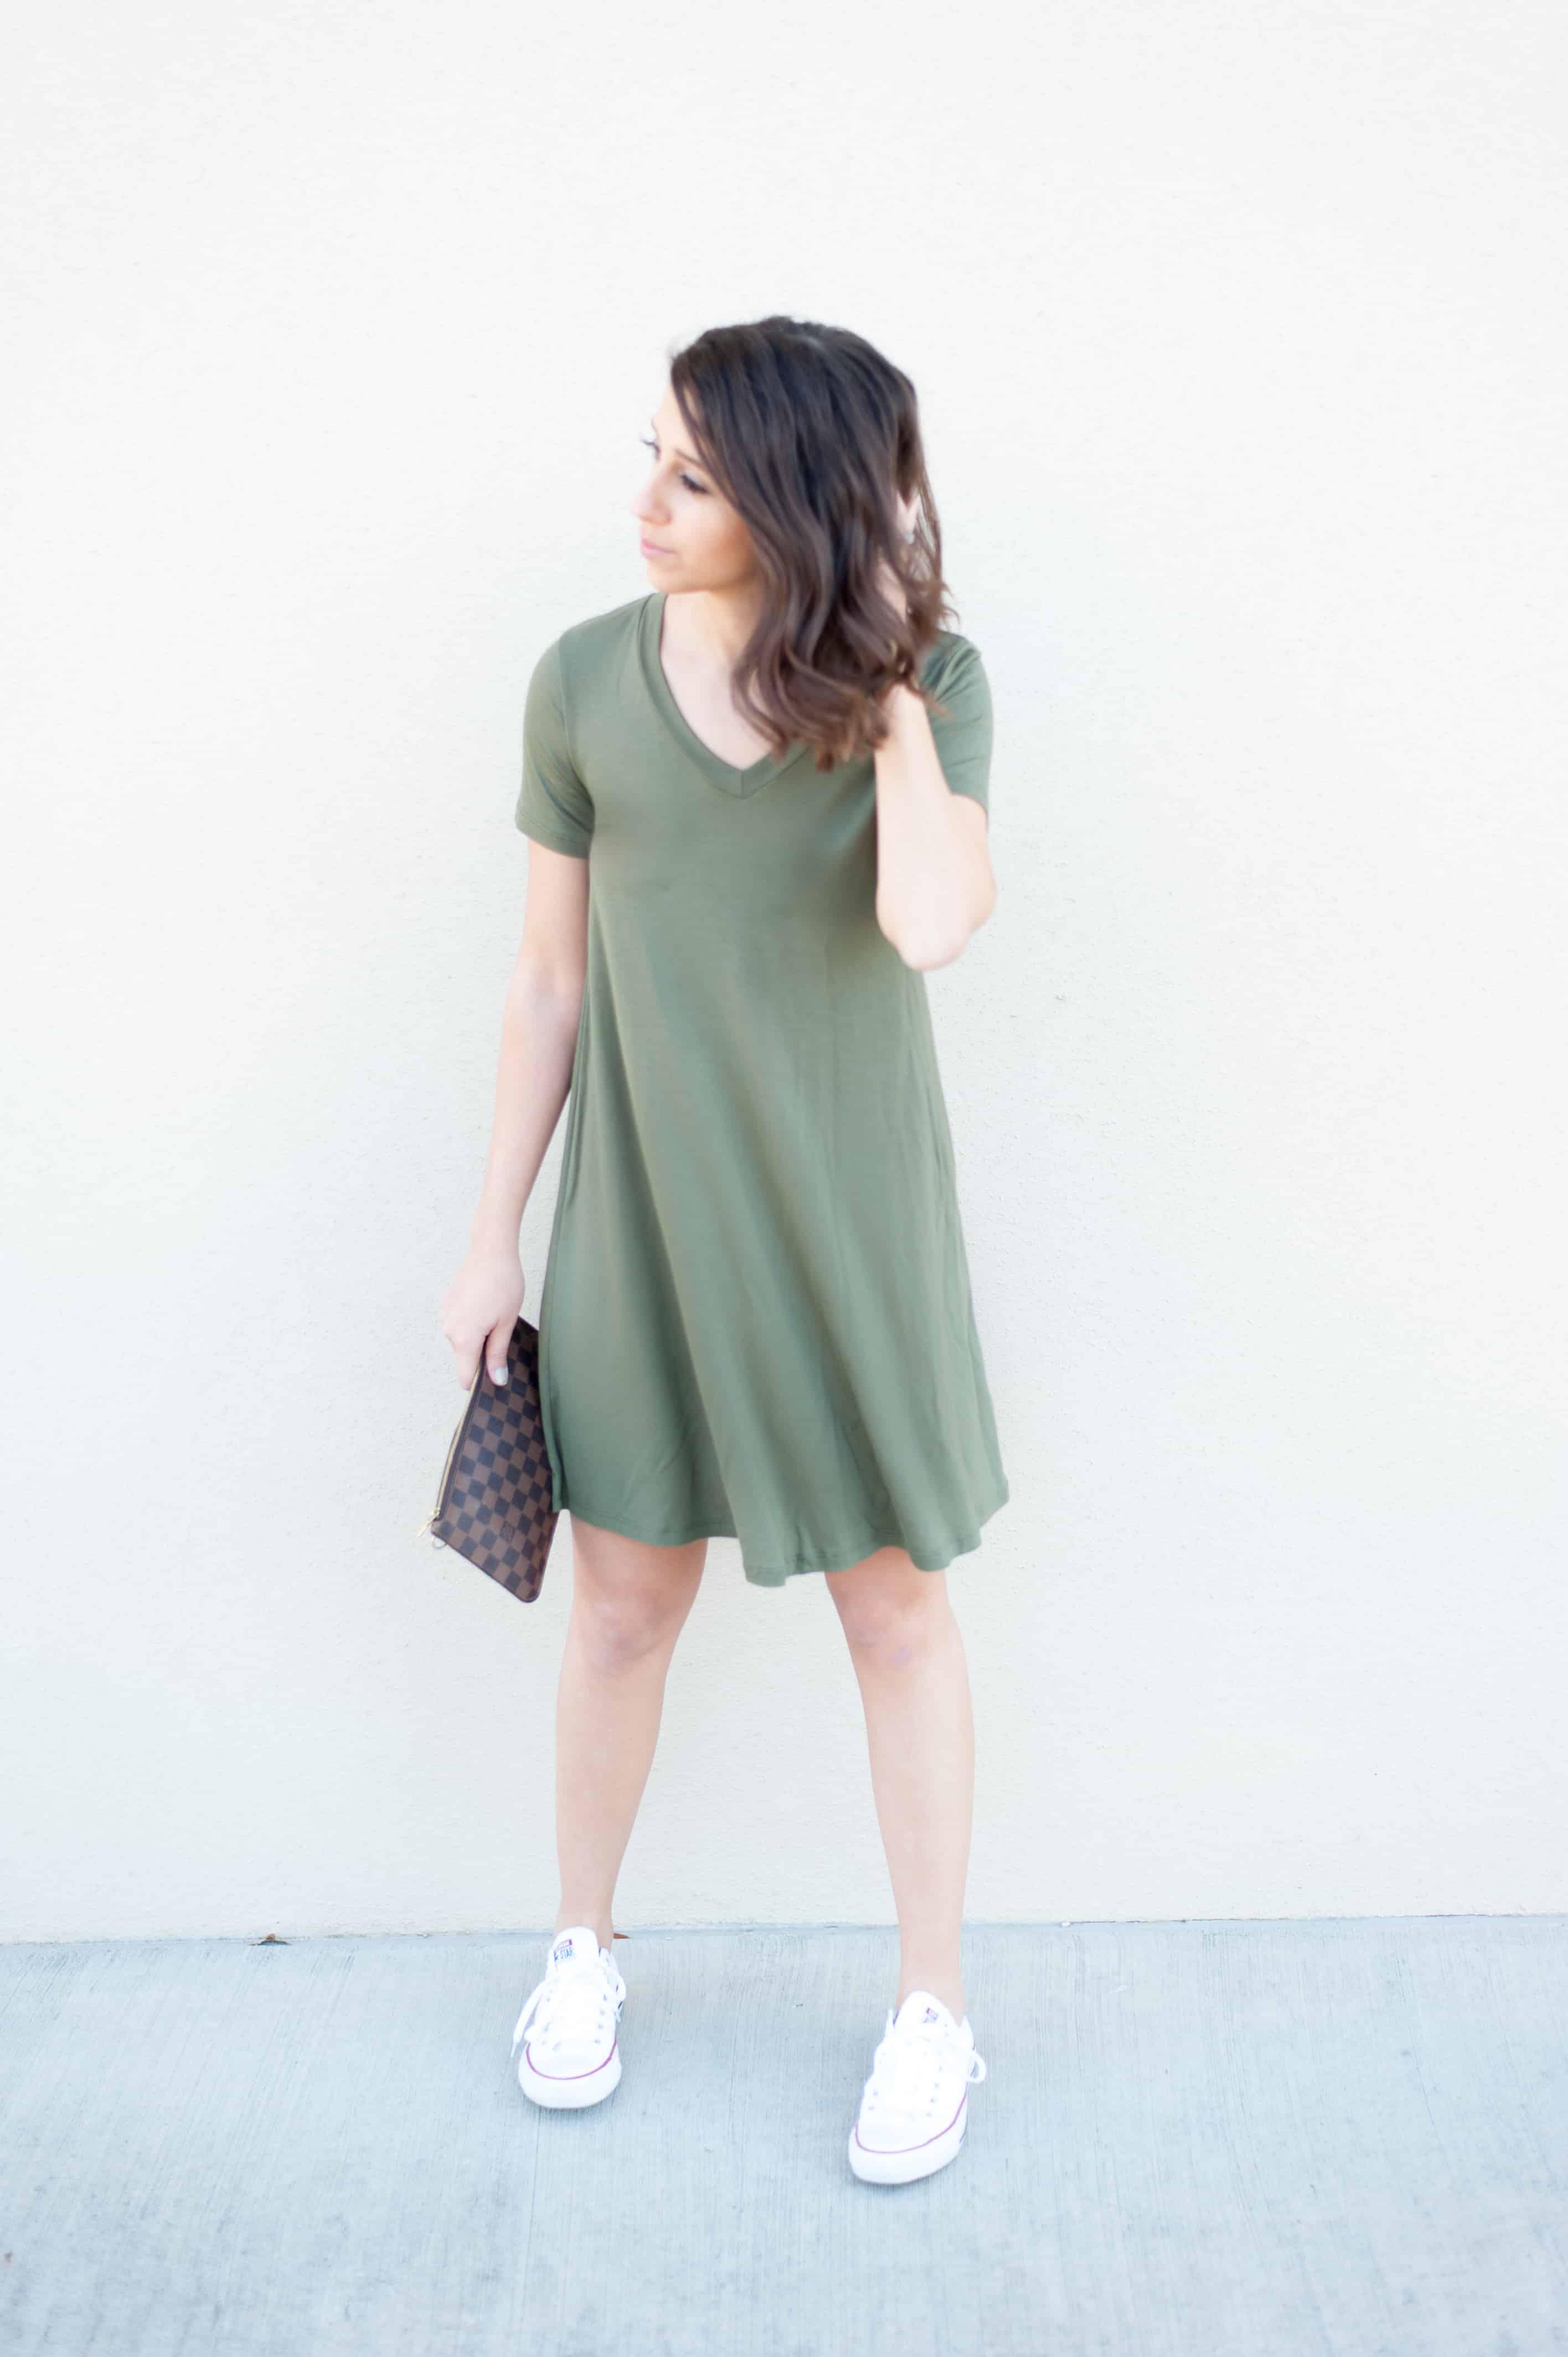 Dress Up Buttercup | Houston Fashion Blog - Dede Raad